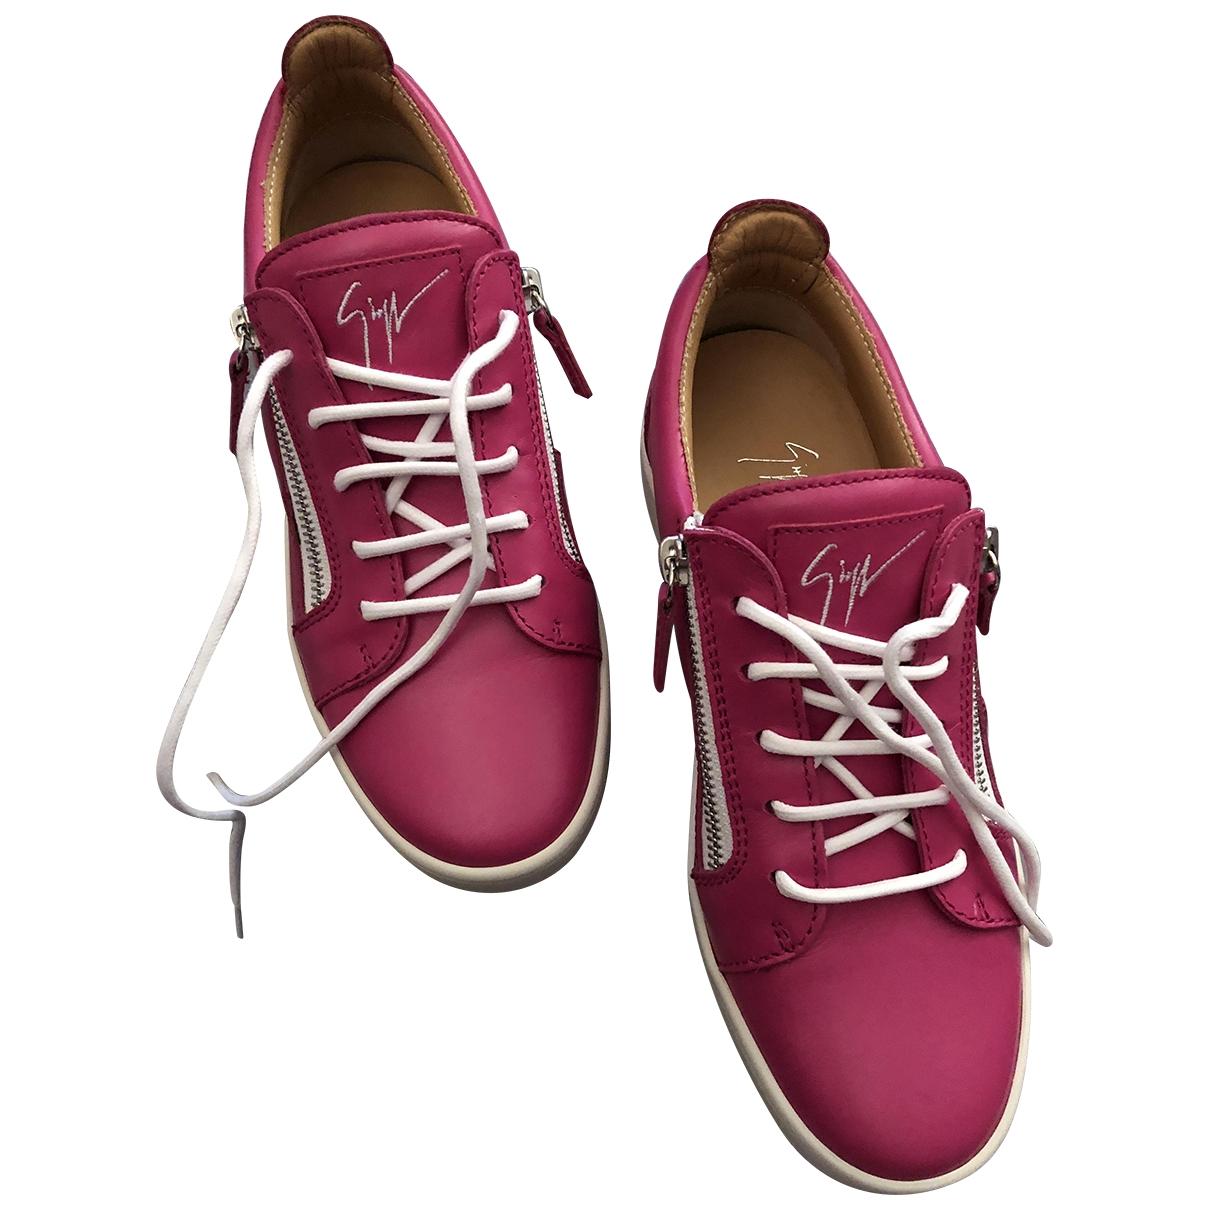 Giuseppe Zanotti - Baskets Nicki pour femme en cuir - rose